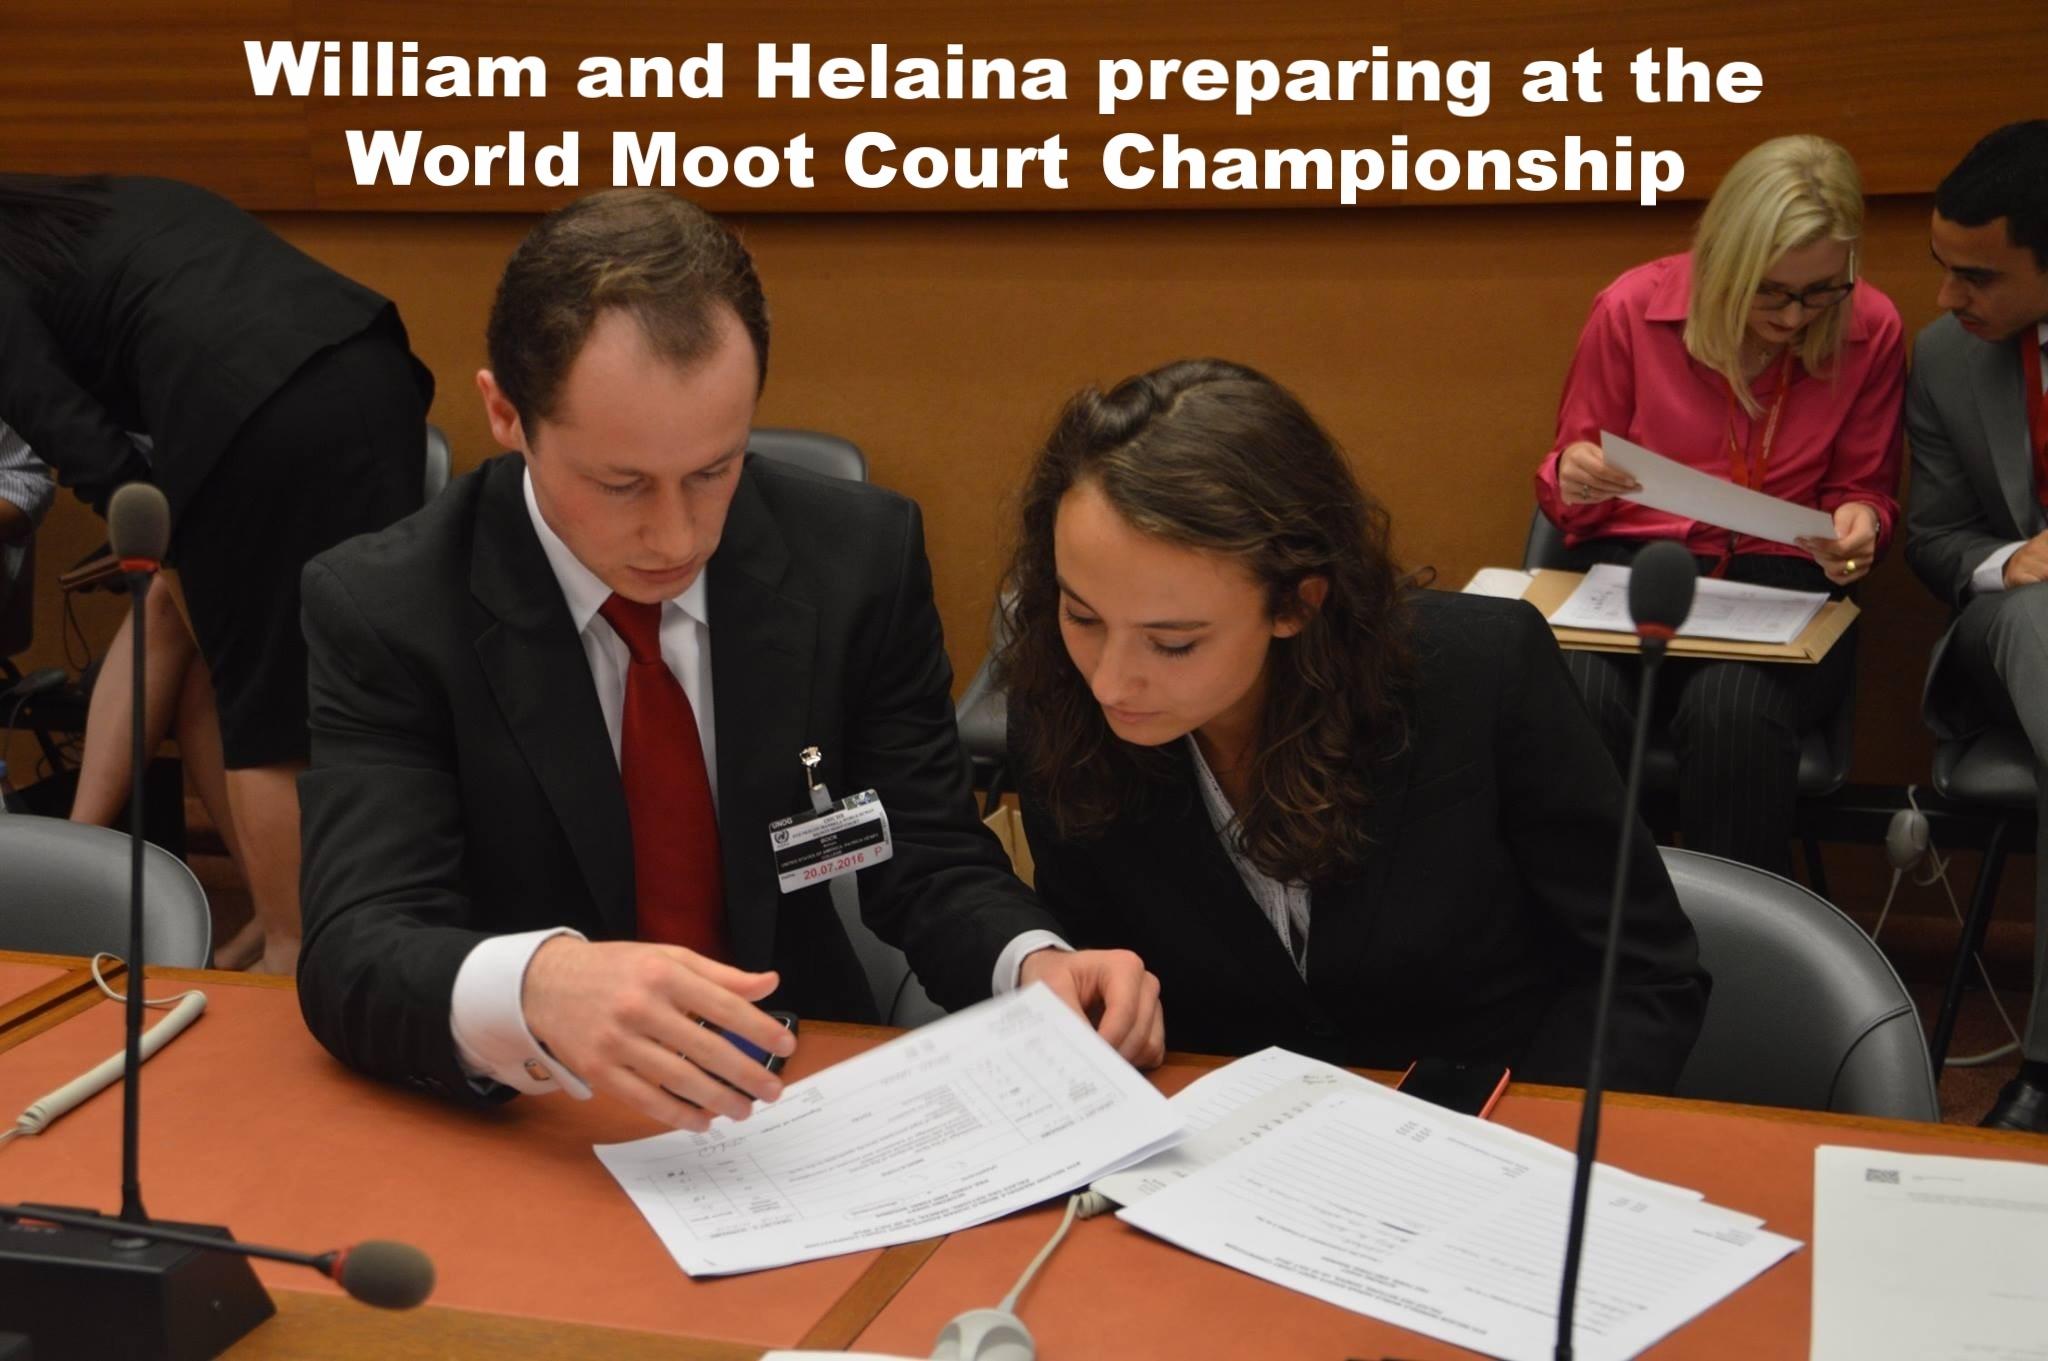 William and Helaina